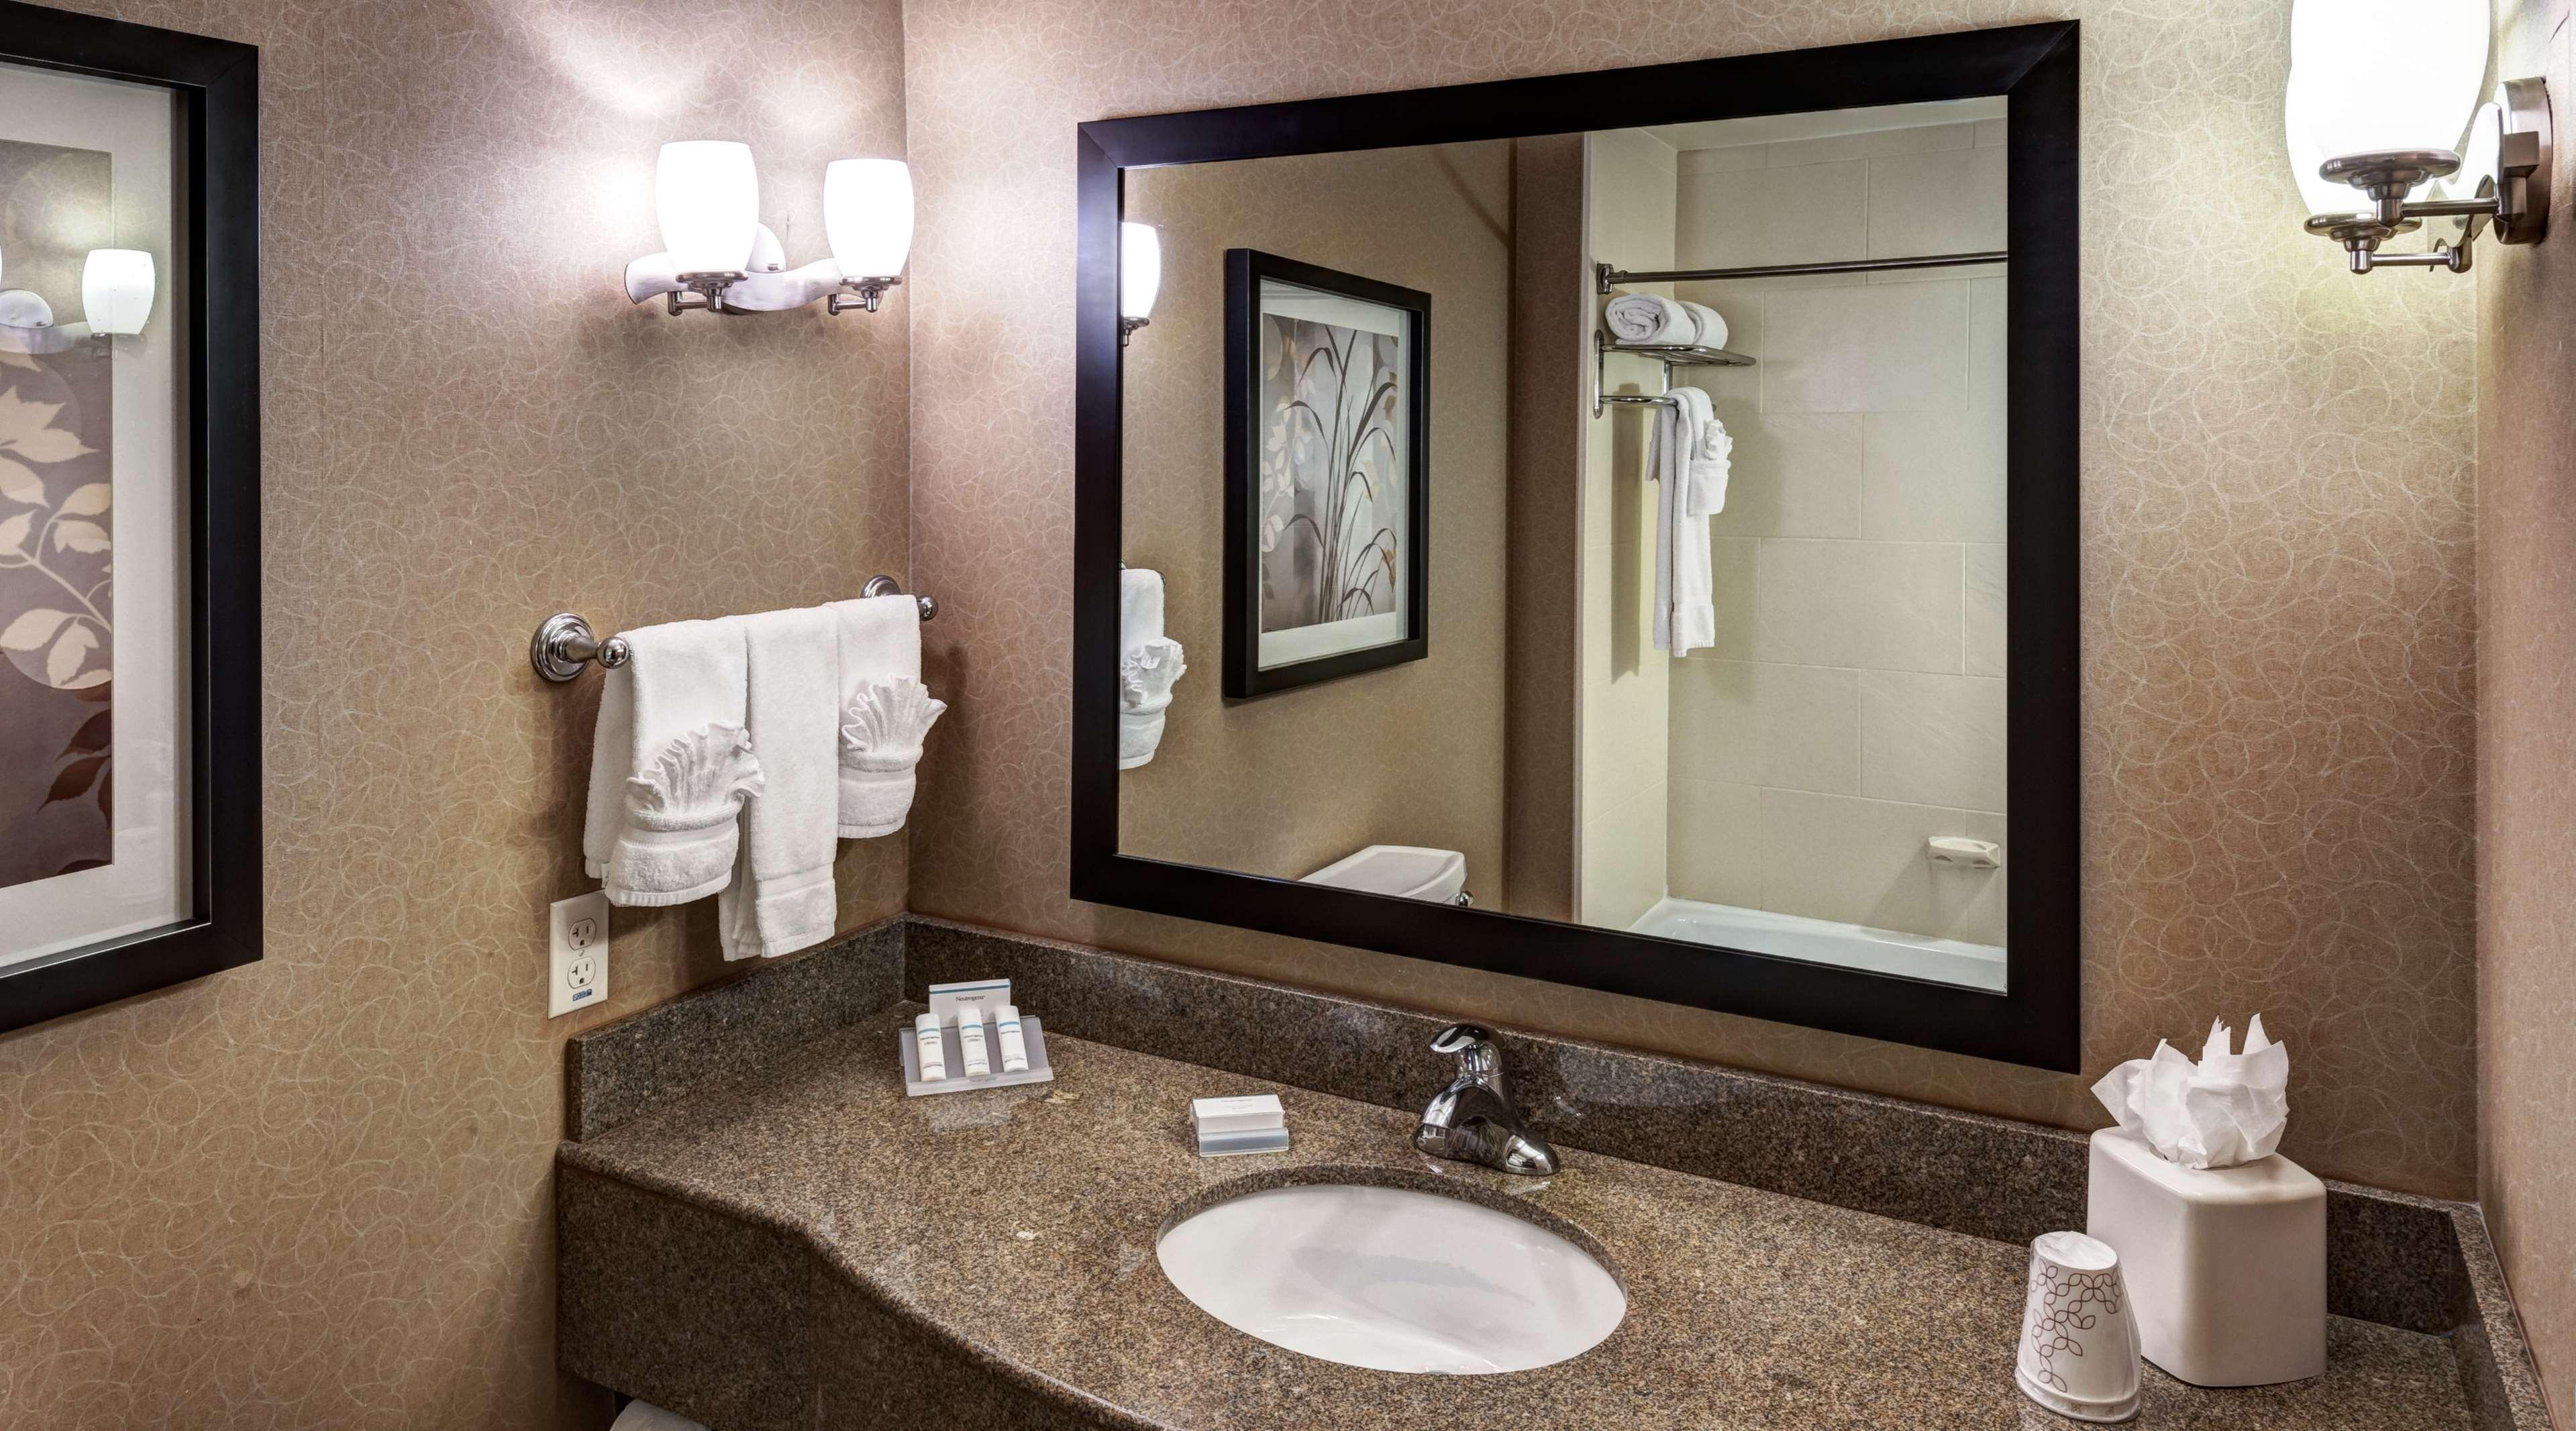 Hilton Garden Inn DFW North Grapevine image 33